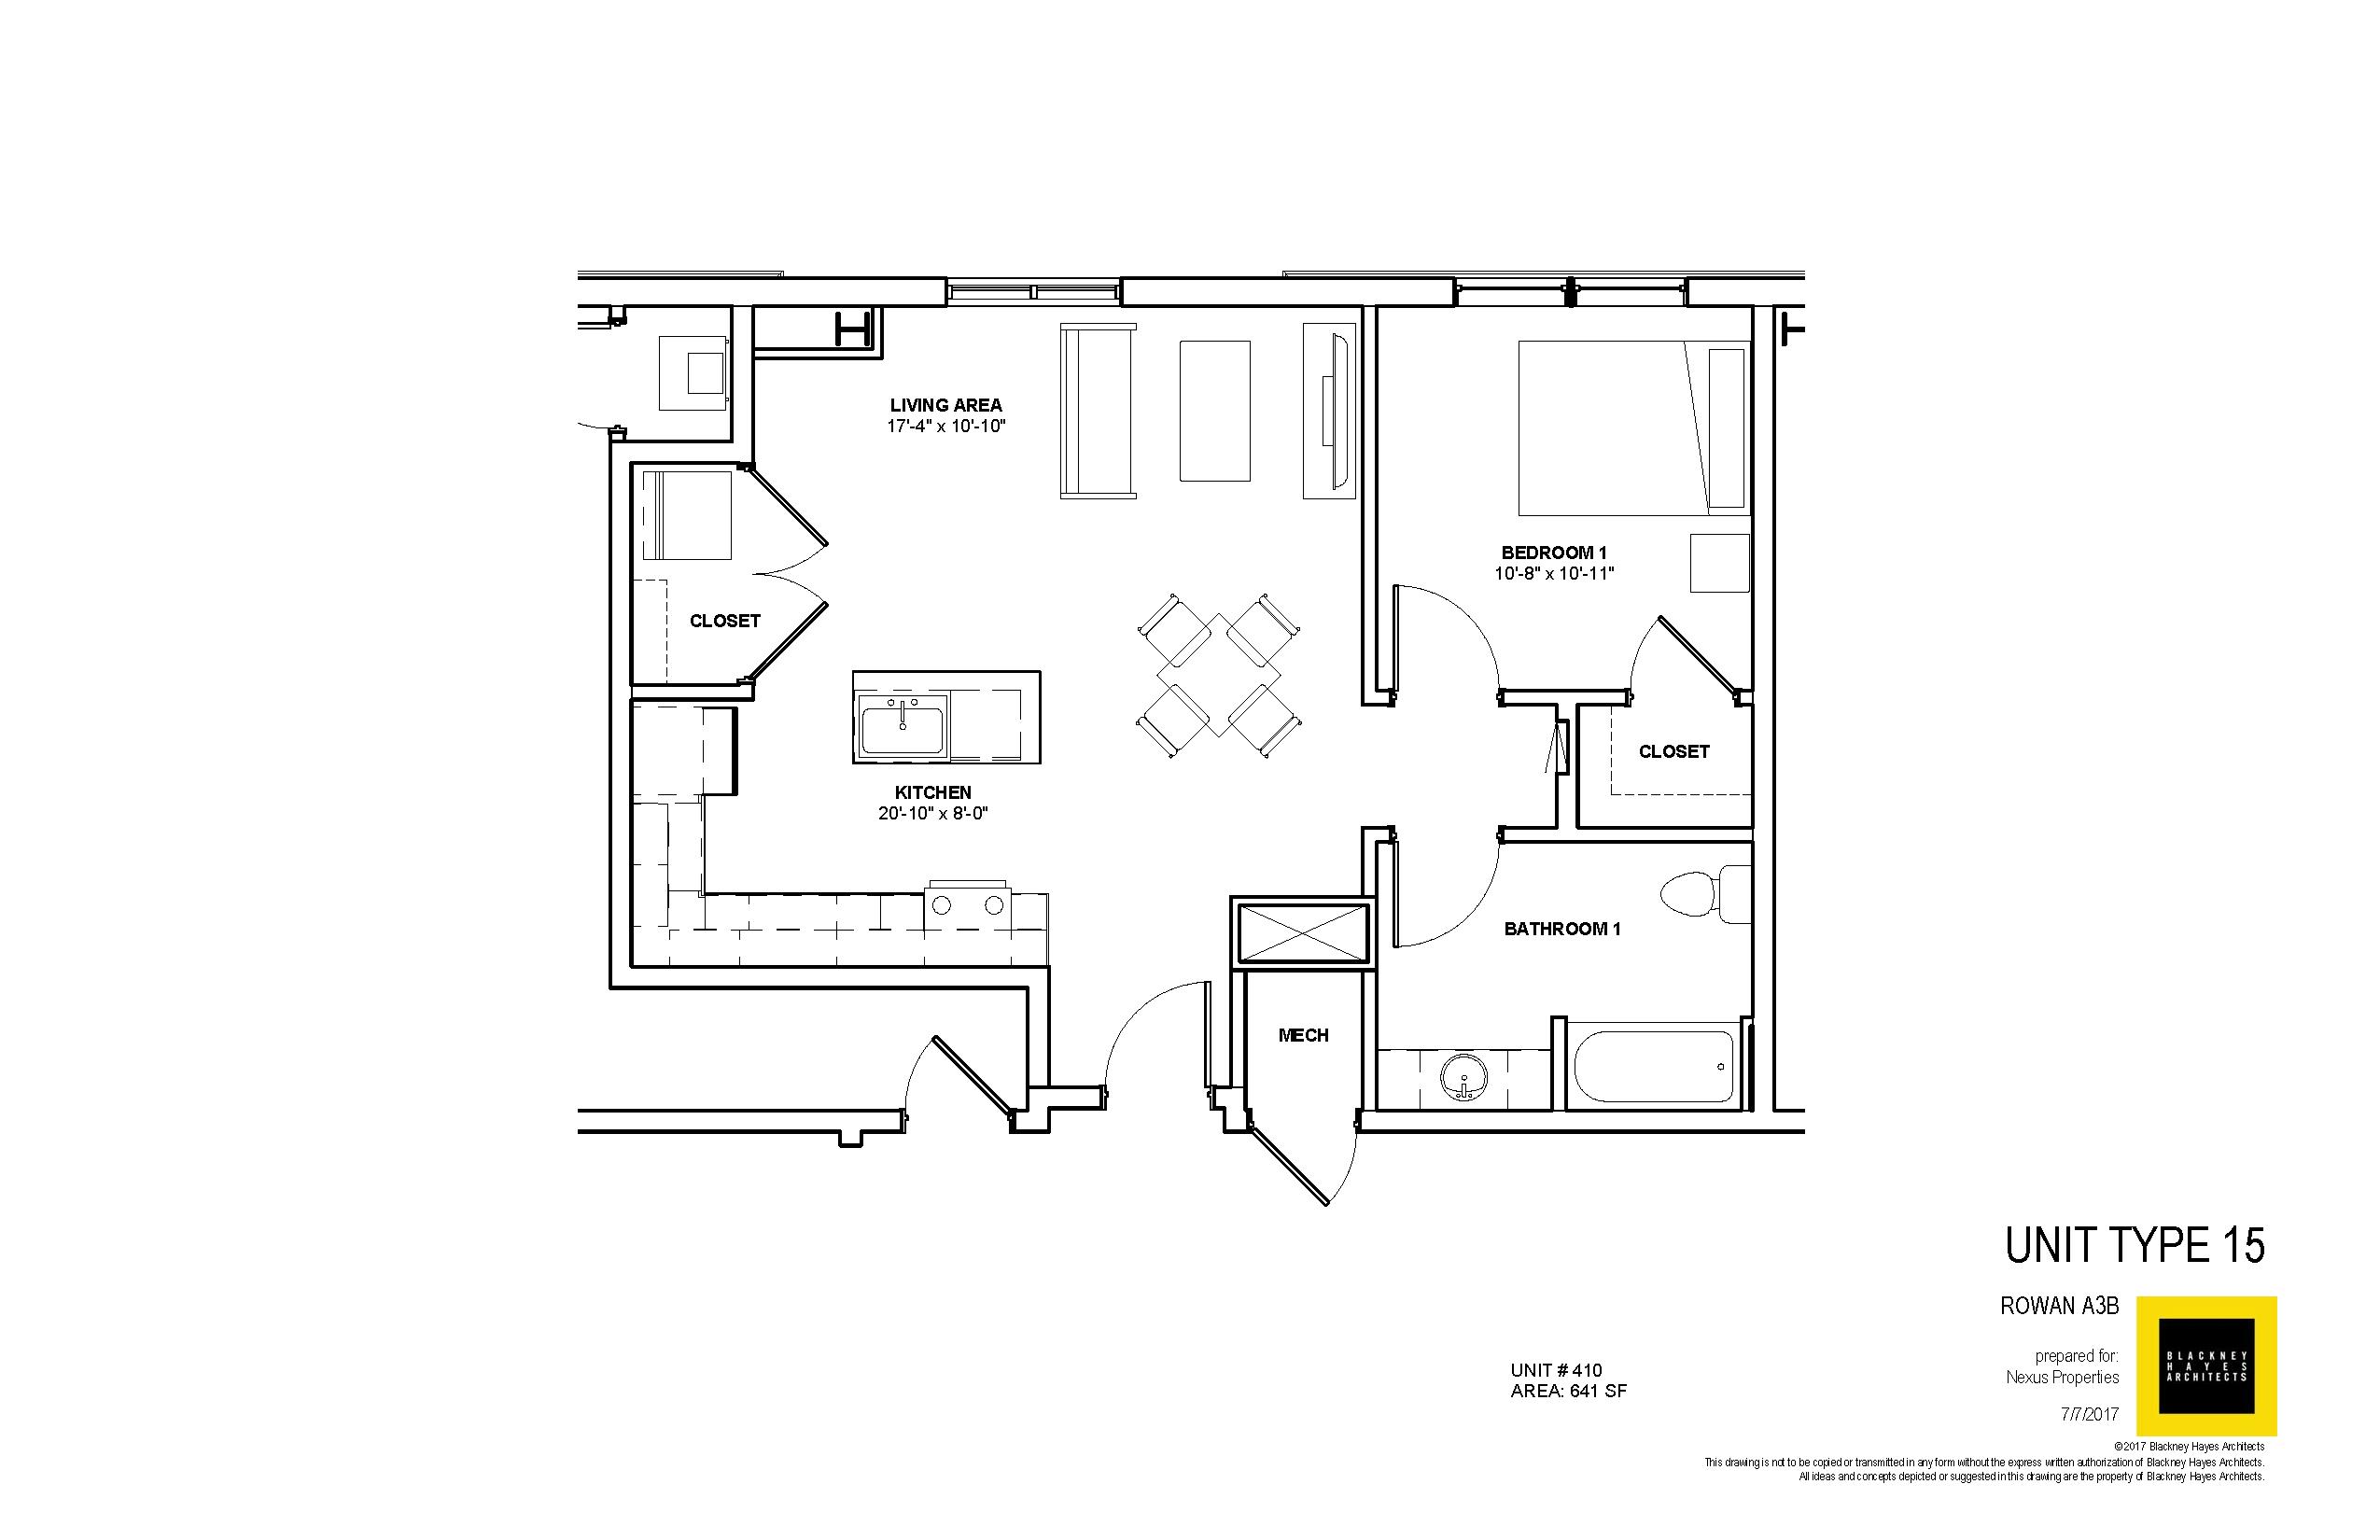 park place south floor plans  u2014 nexus properties